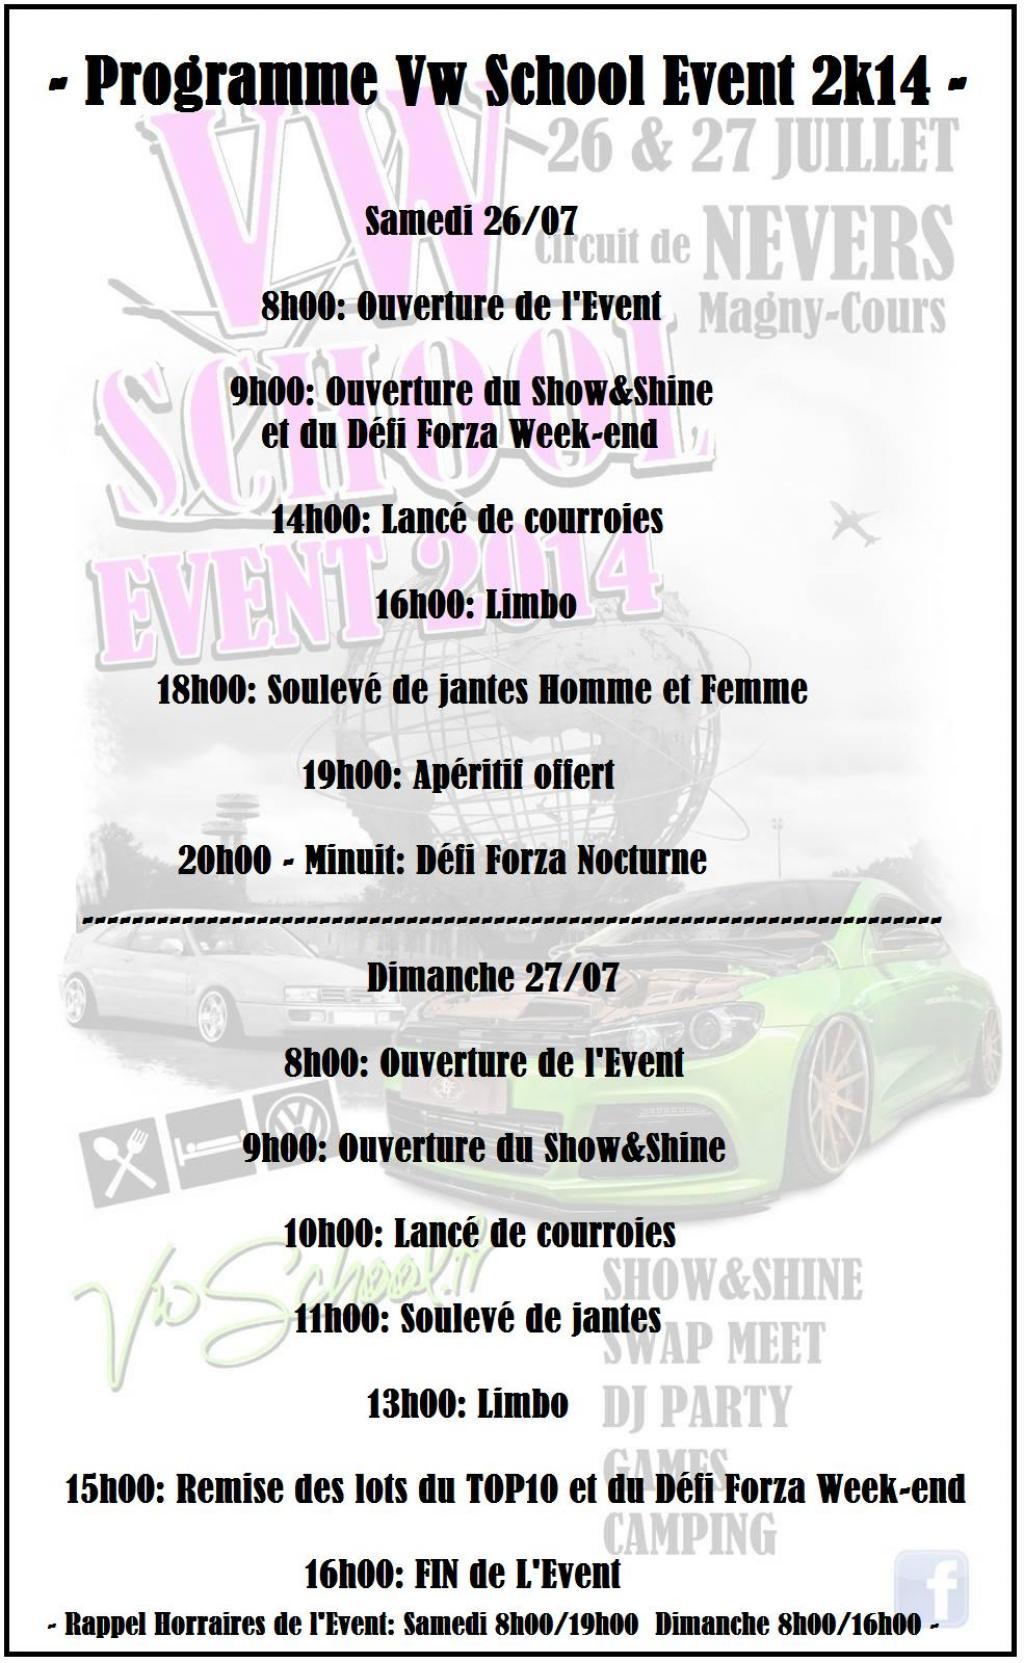 -- Vw SCHOOL EVENT 2014 - 26& 27 juillet -- Programme-event-458aff3